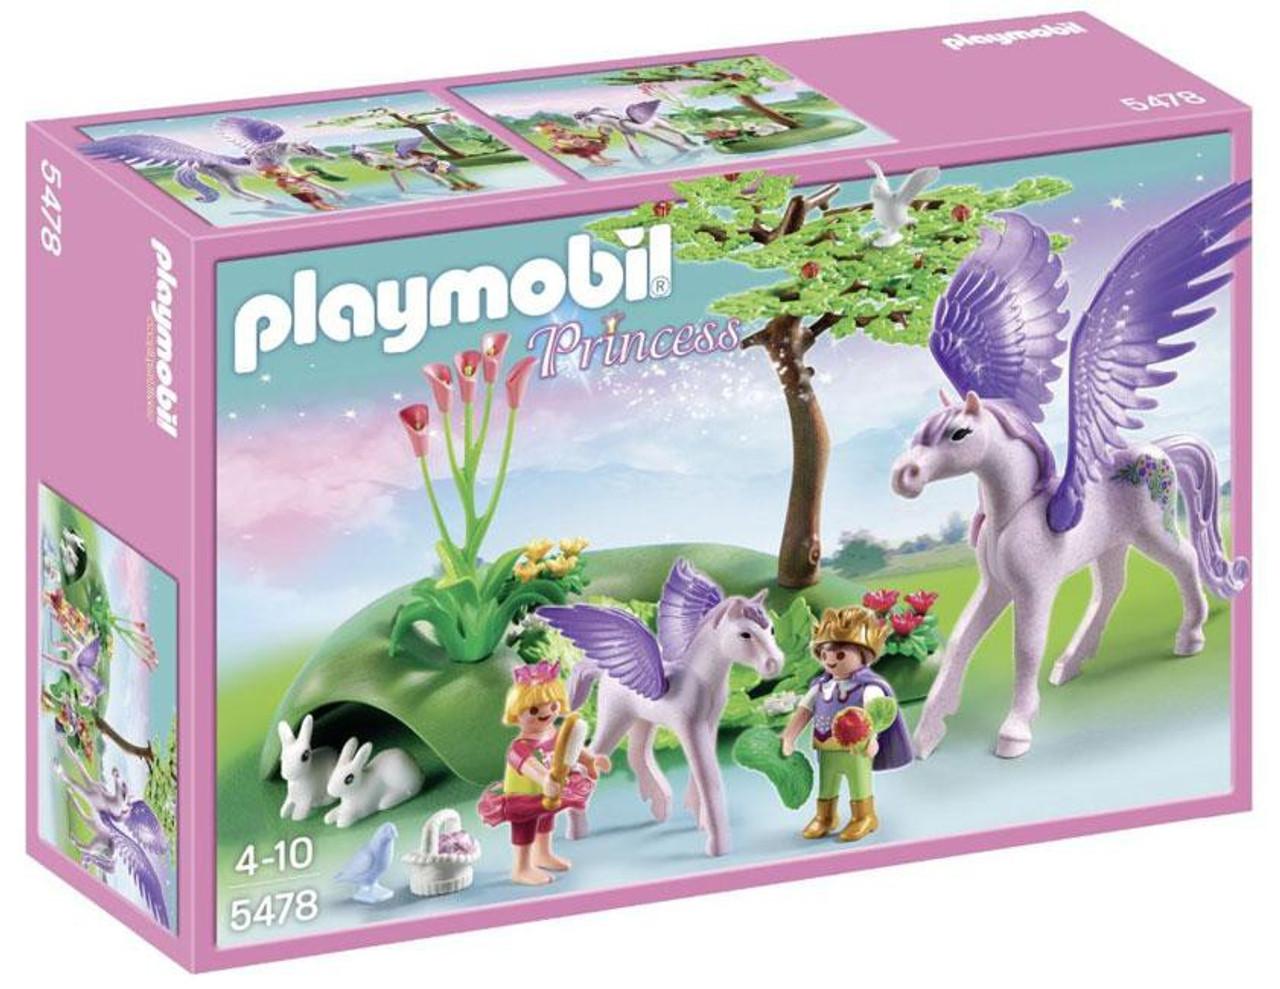 Playmobil Fairies Royal Children with Pegasus & Baby Set #5478